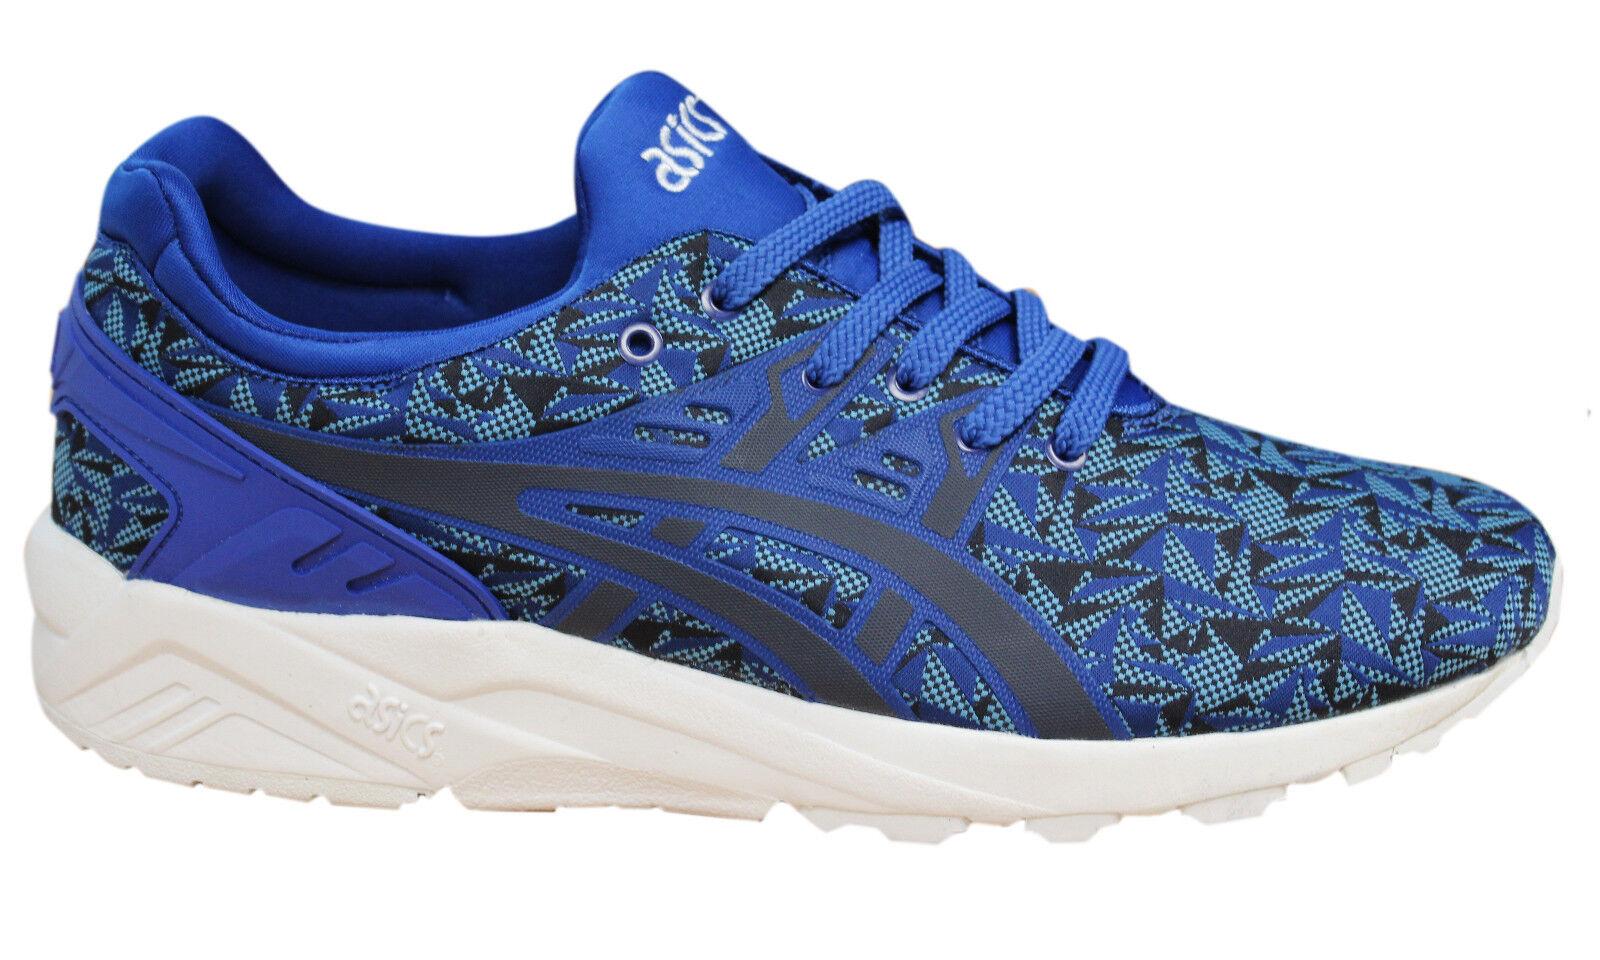 Asics Gel-Kayano Turnschuhe EVO Herren Schnürschuh Textil blau H621N 4950 D6